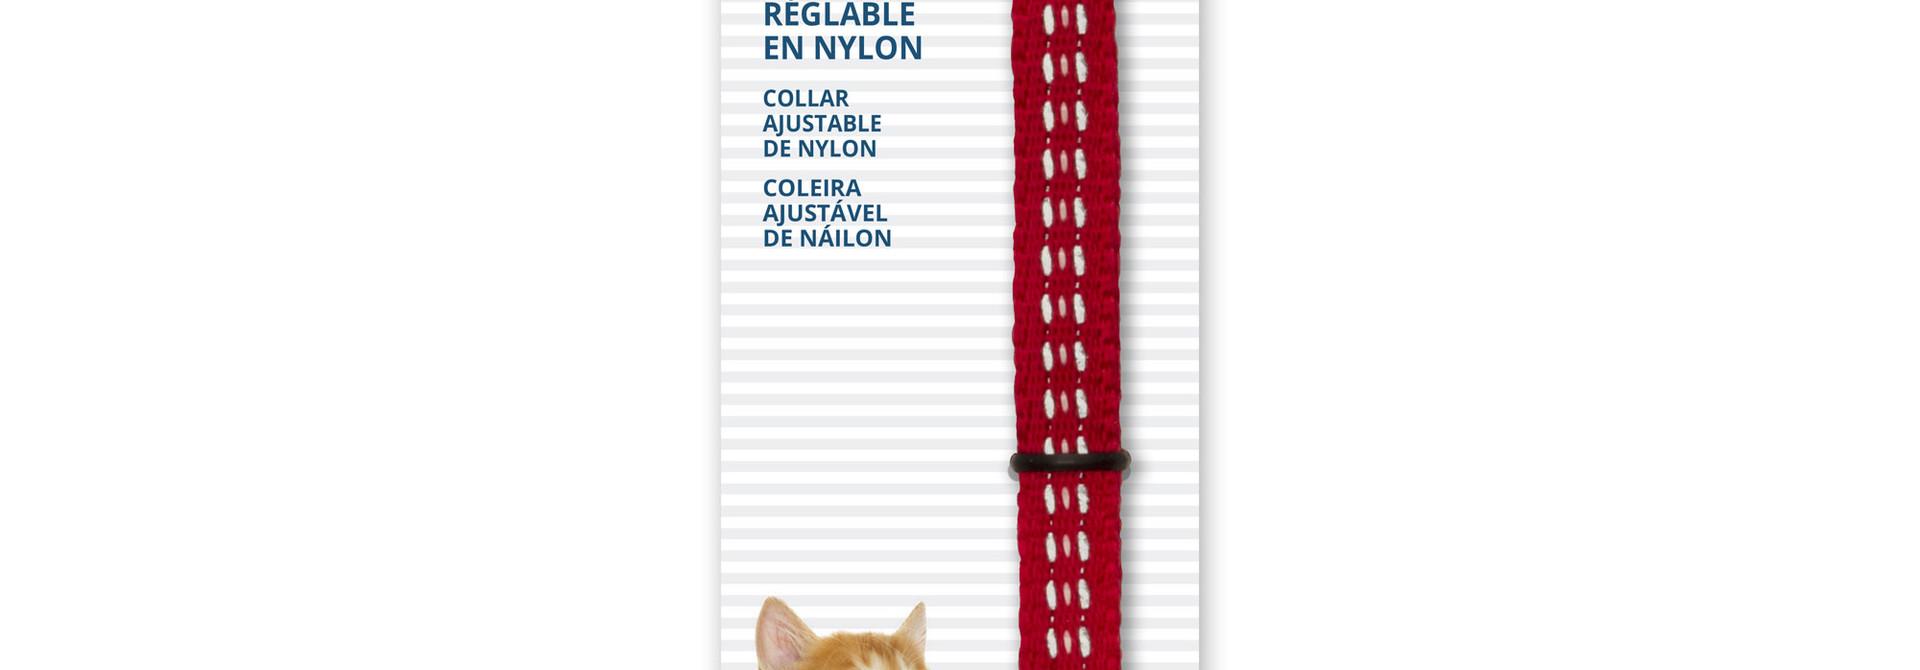 CT Aj. Nyl. Collar, Refl. 20-33cm,Red